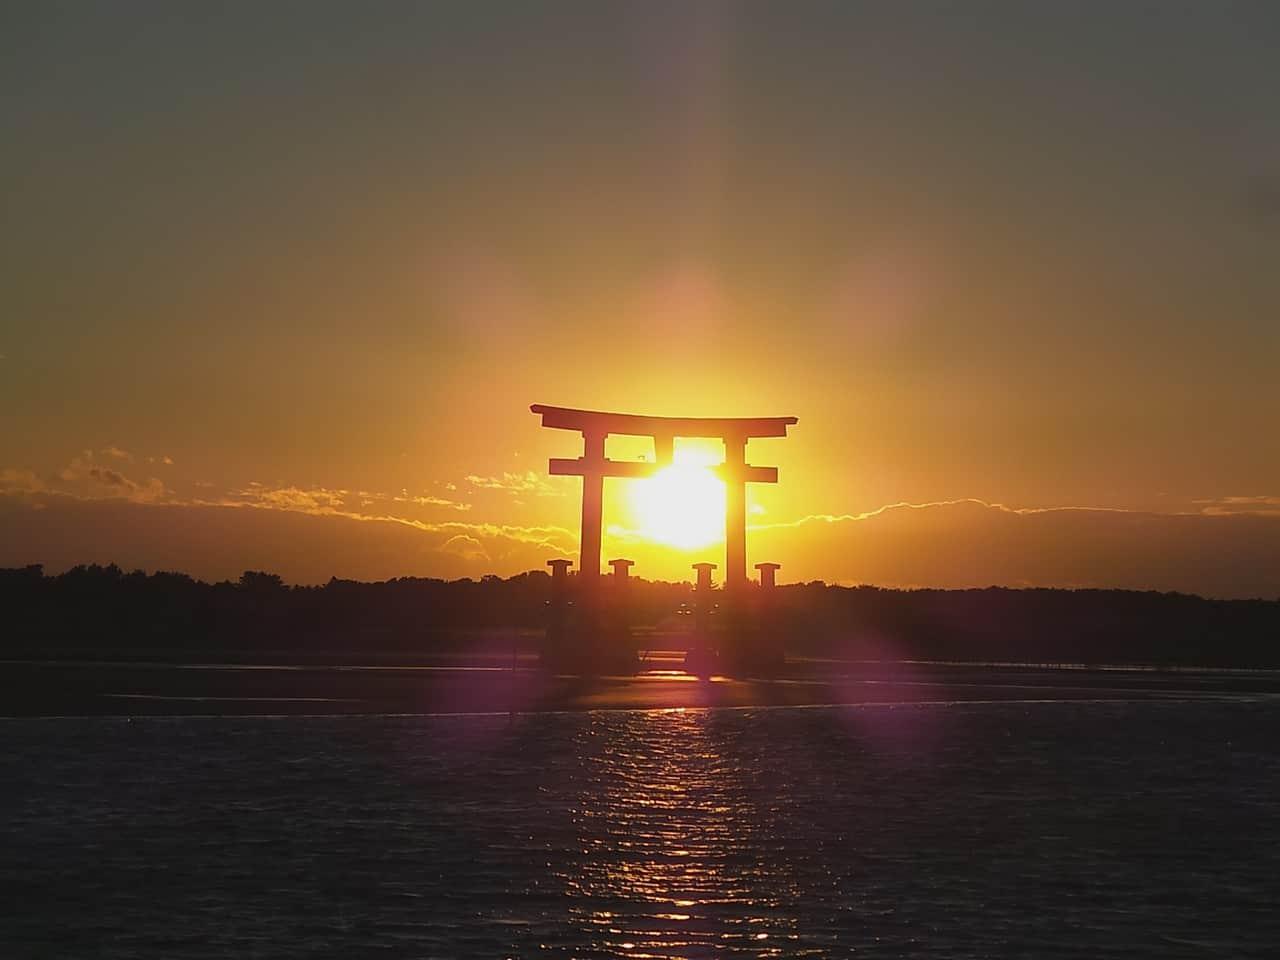 Autour du lac Hamana-ko : ma nuit dans un ryokan du village onsen de Kanzanji